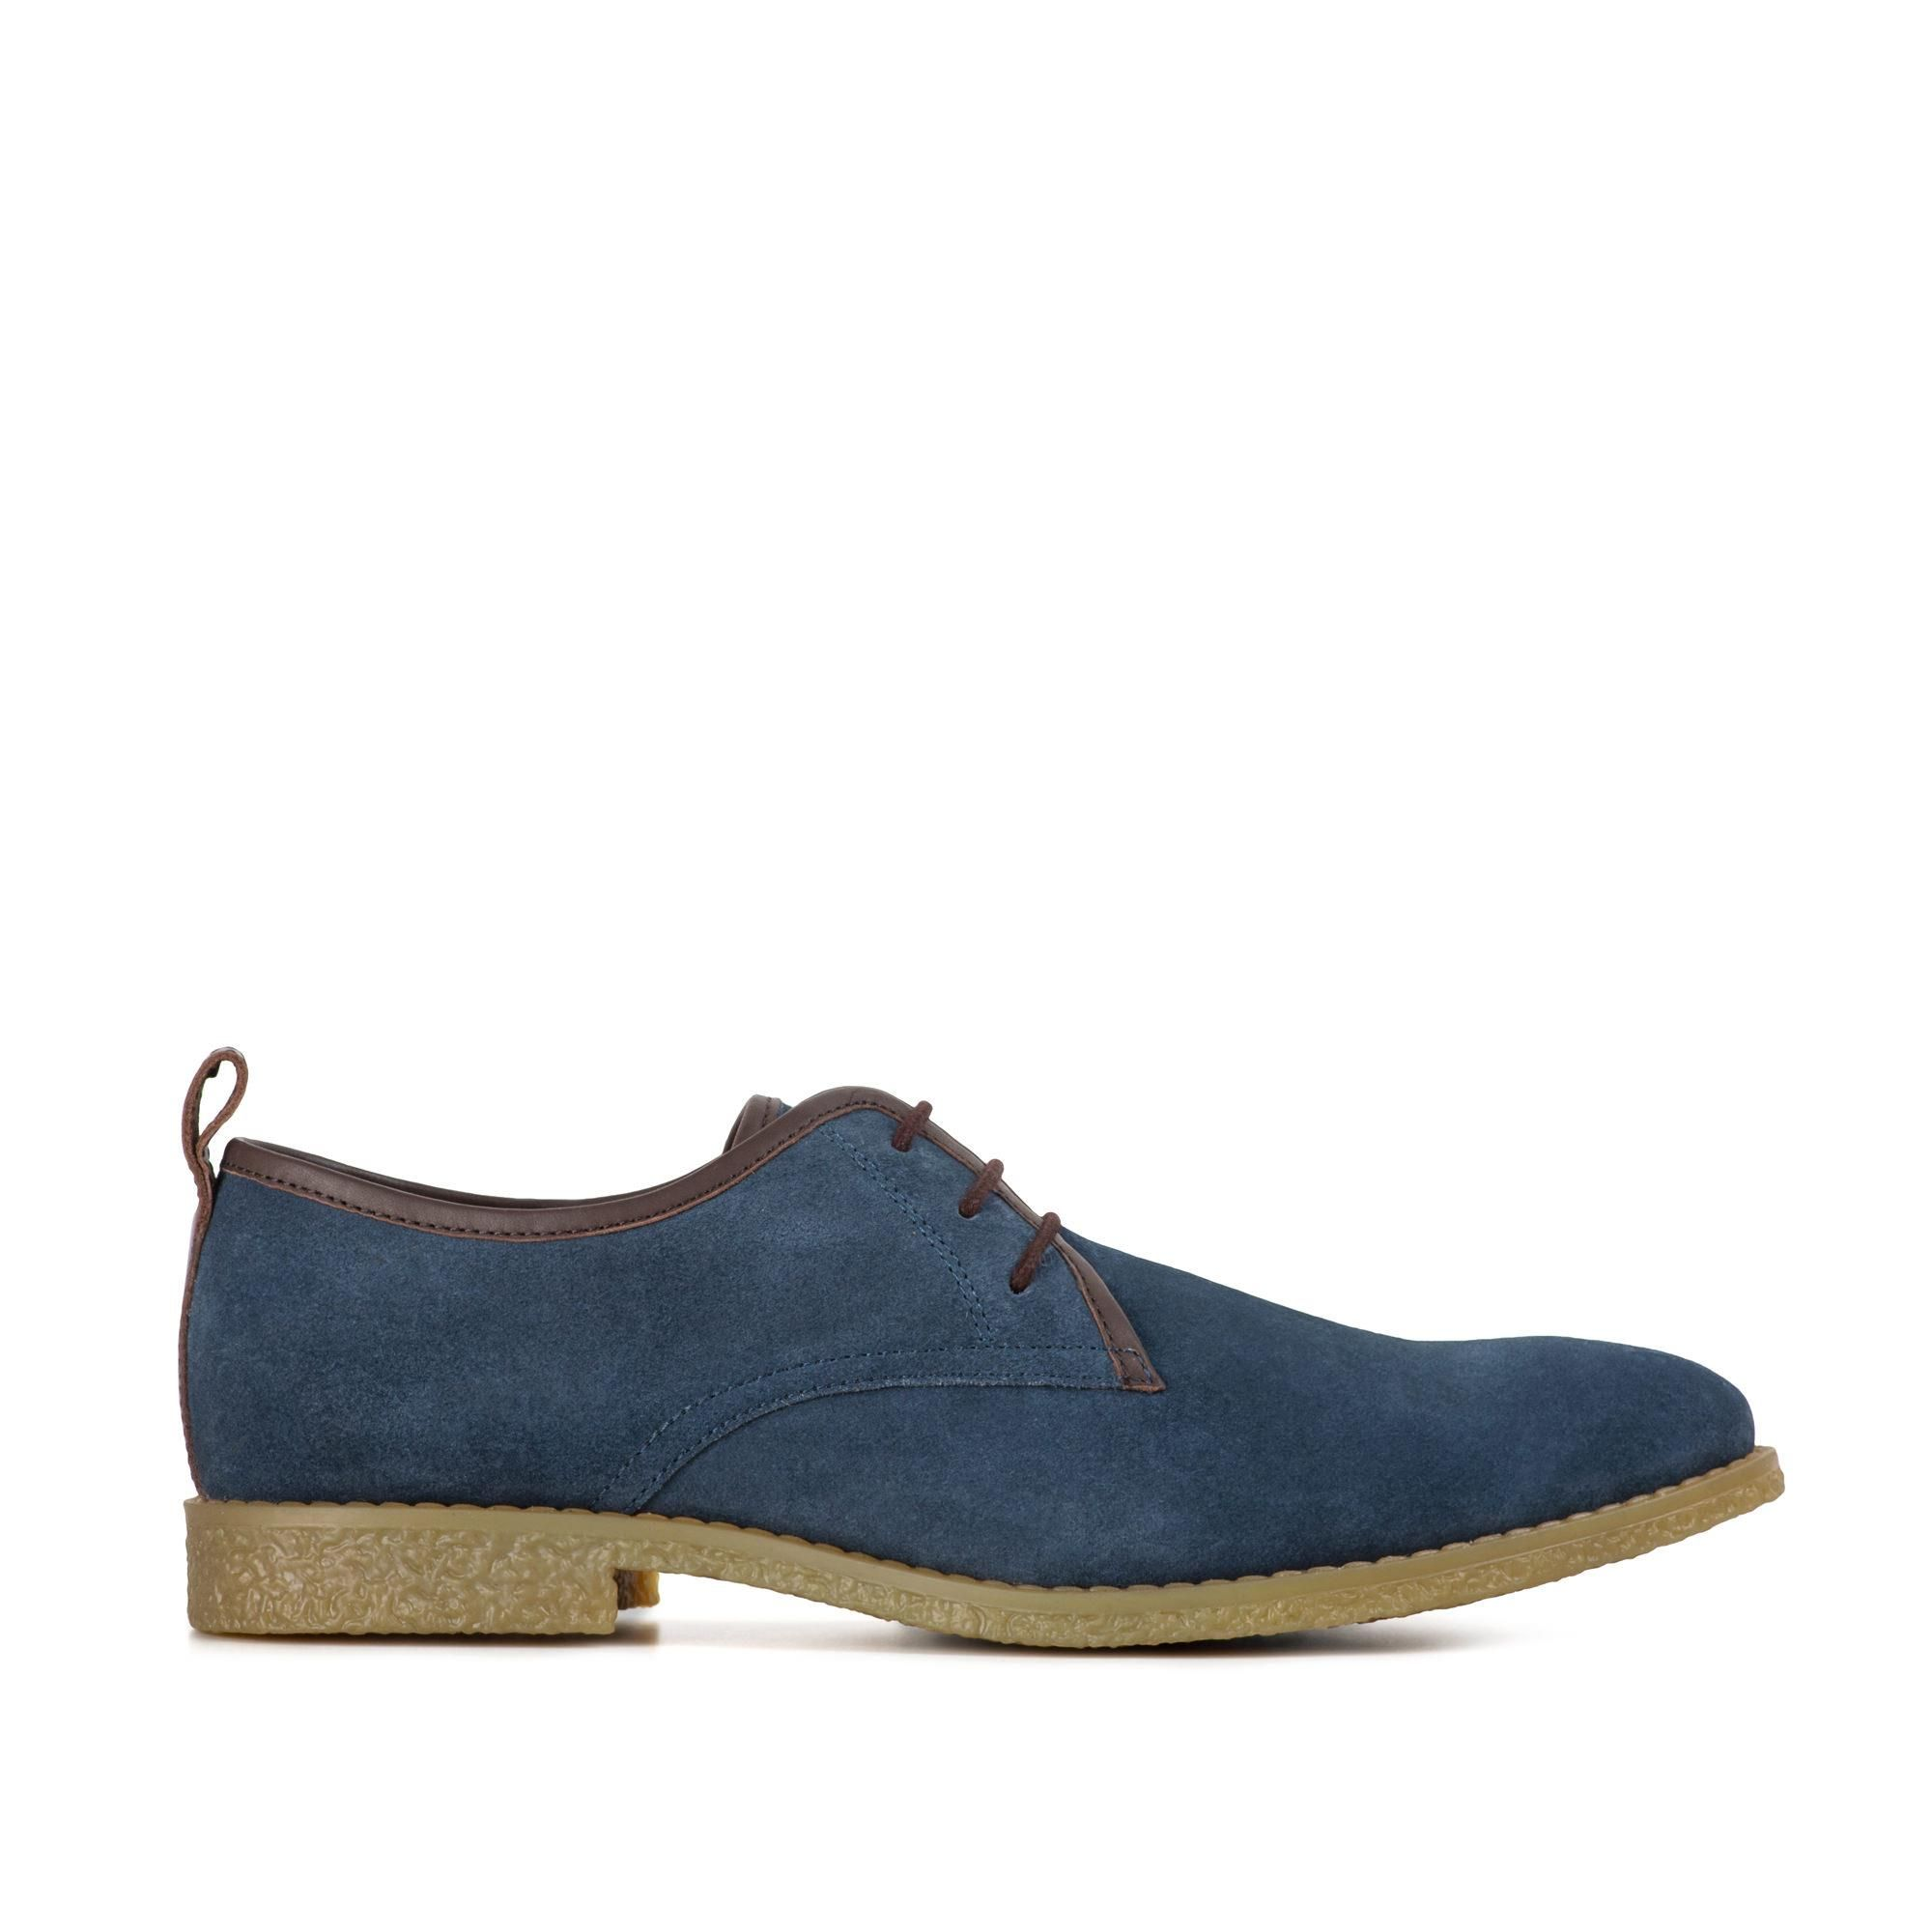 Redfoot Lewis Navy Suede Desert Shoe